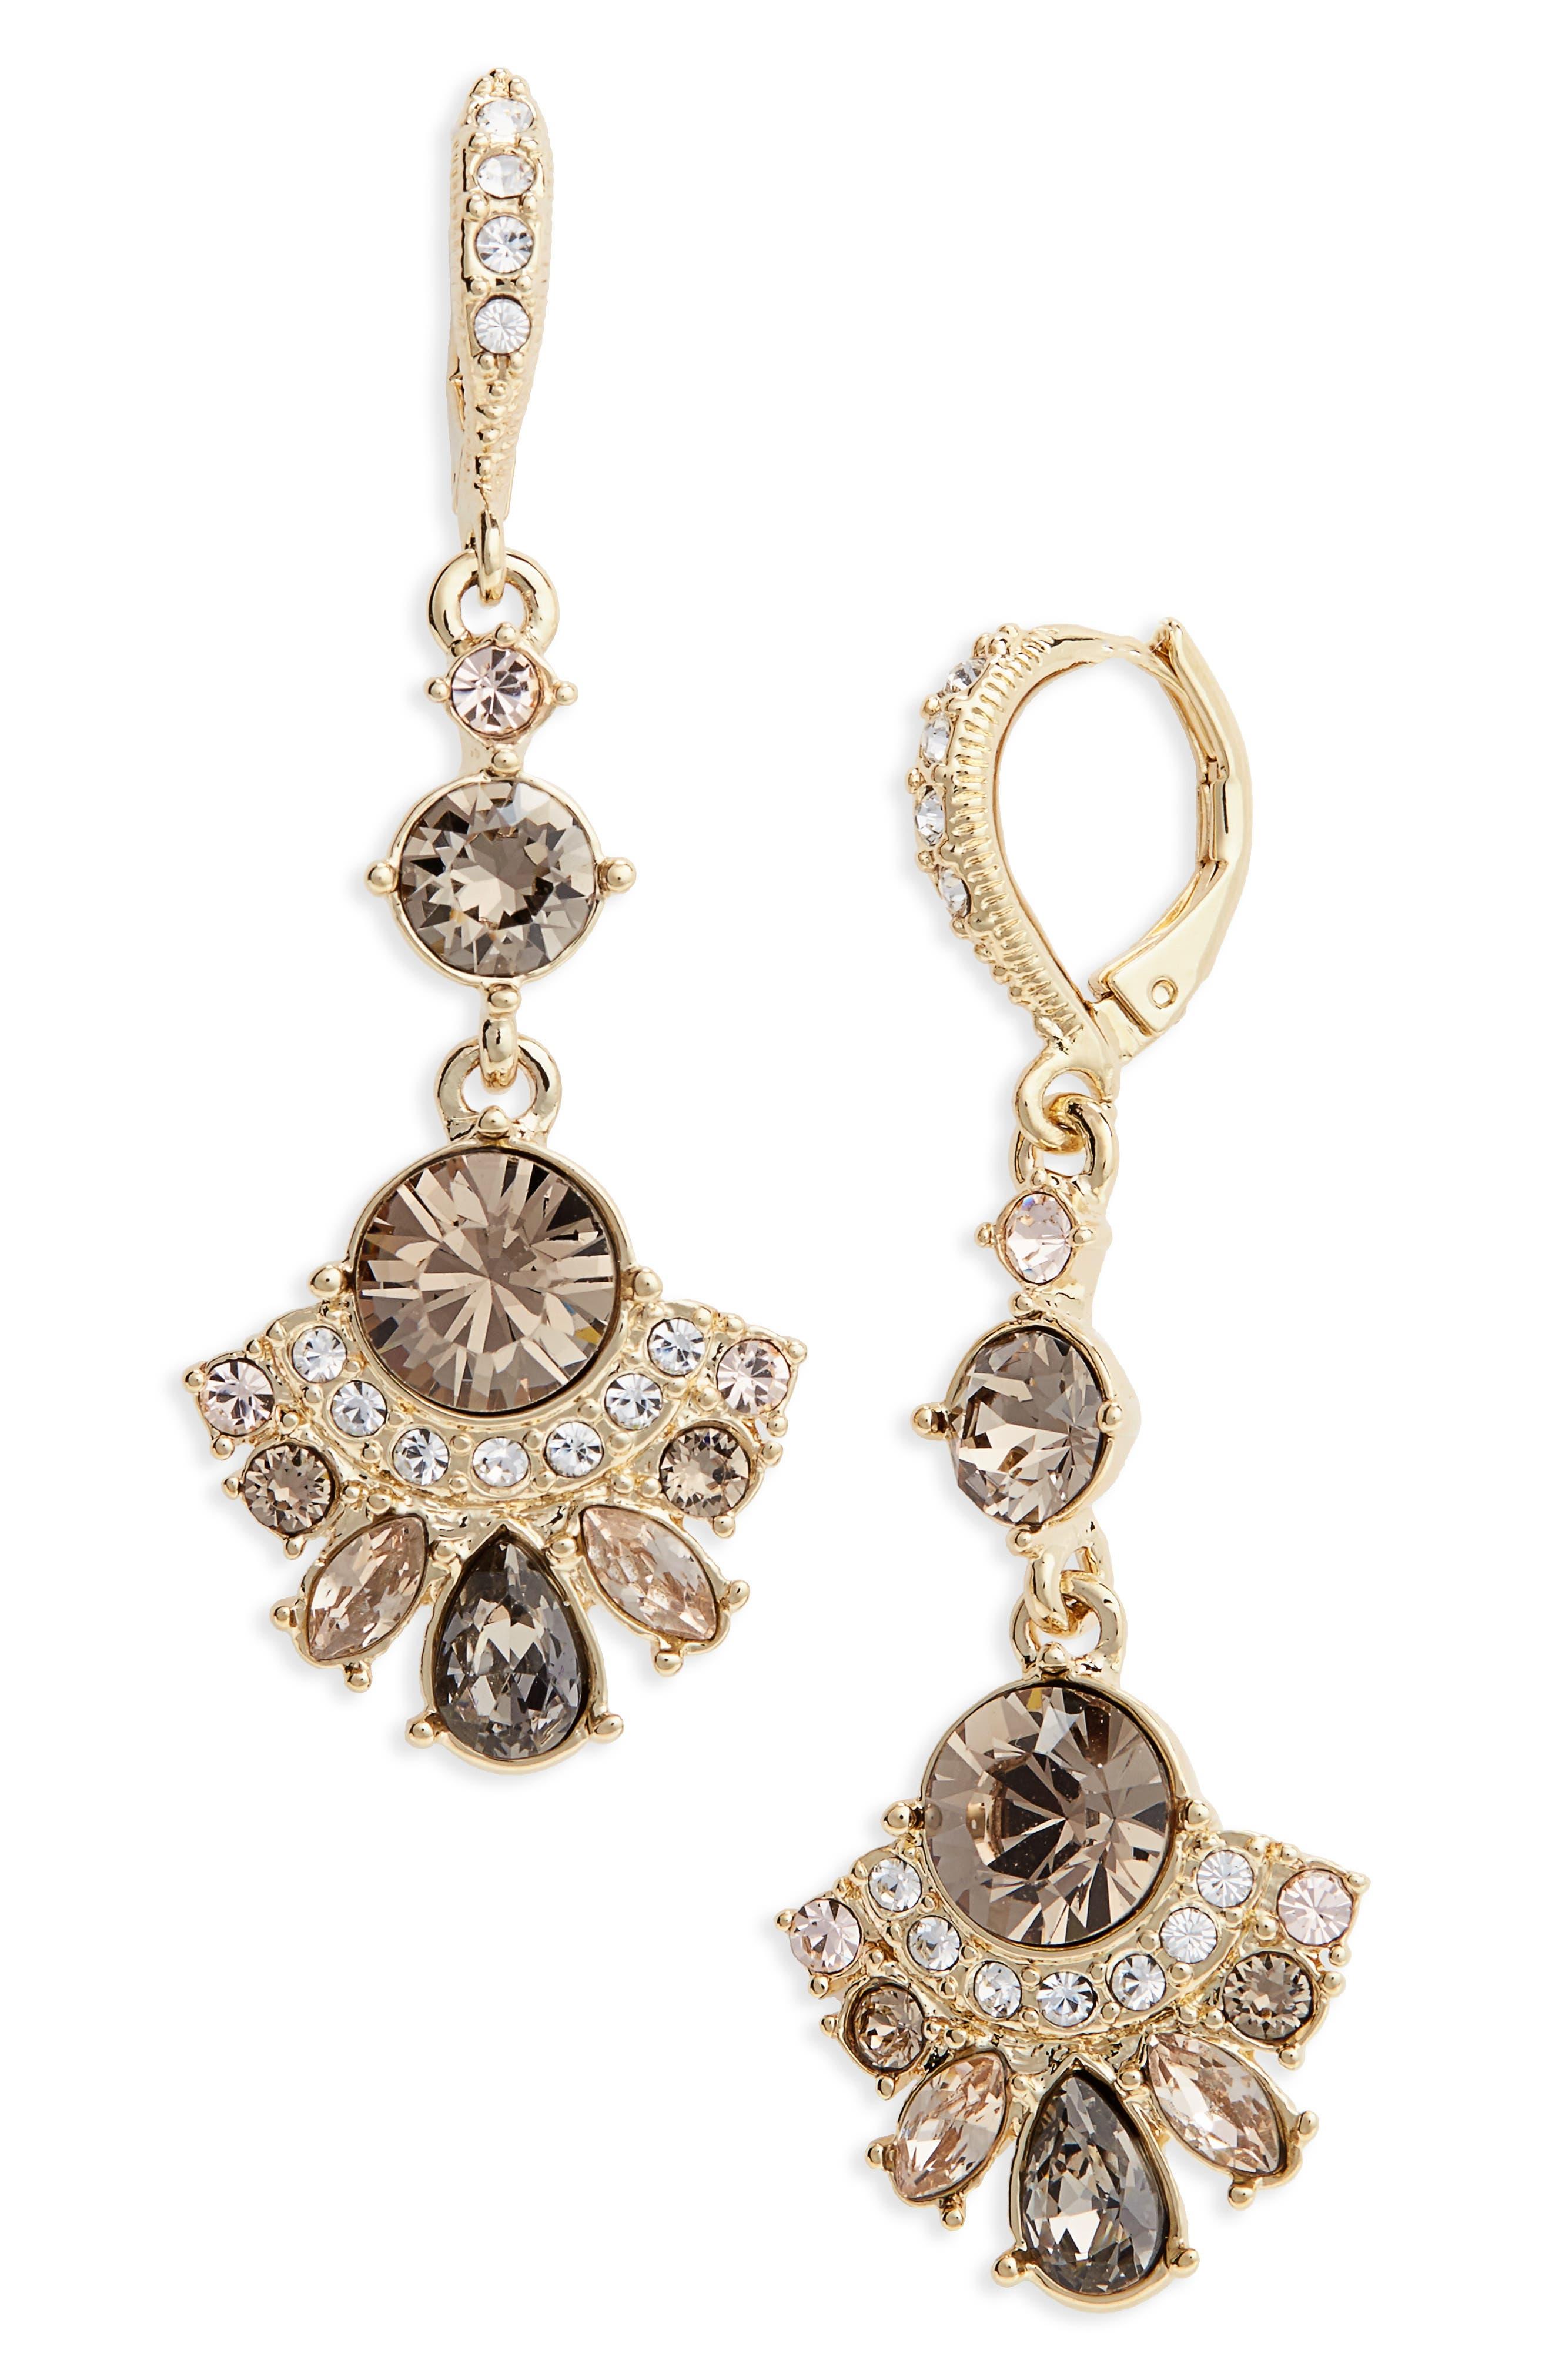 Verona Drop Earrings,                             Main thumbnail 1, color,                             Greige / Gold